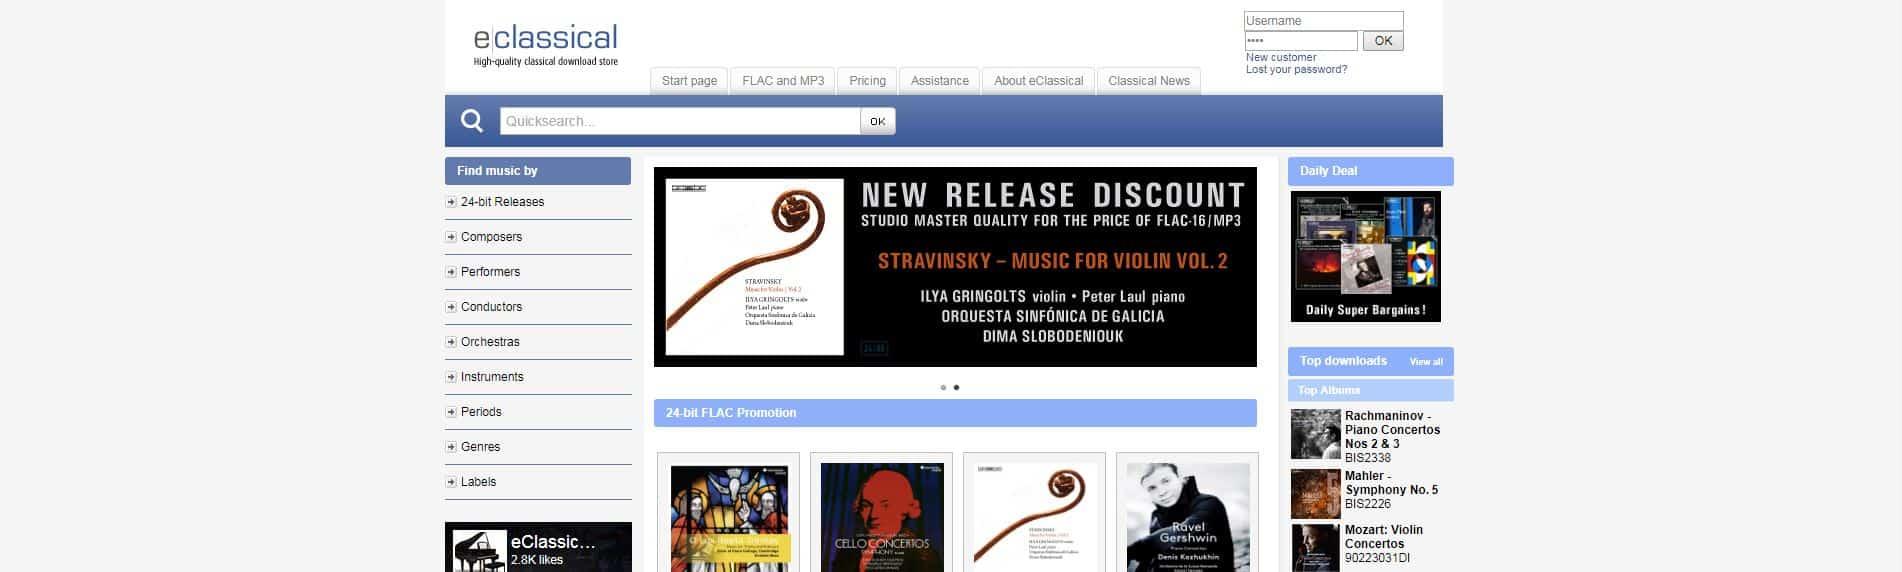 EClassical hi def music site